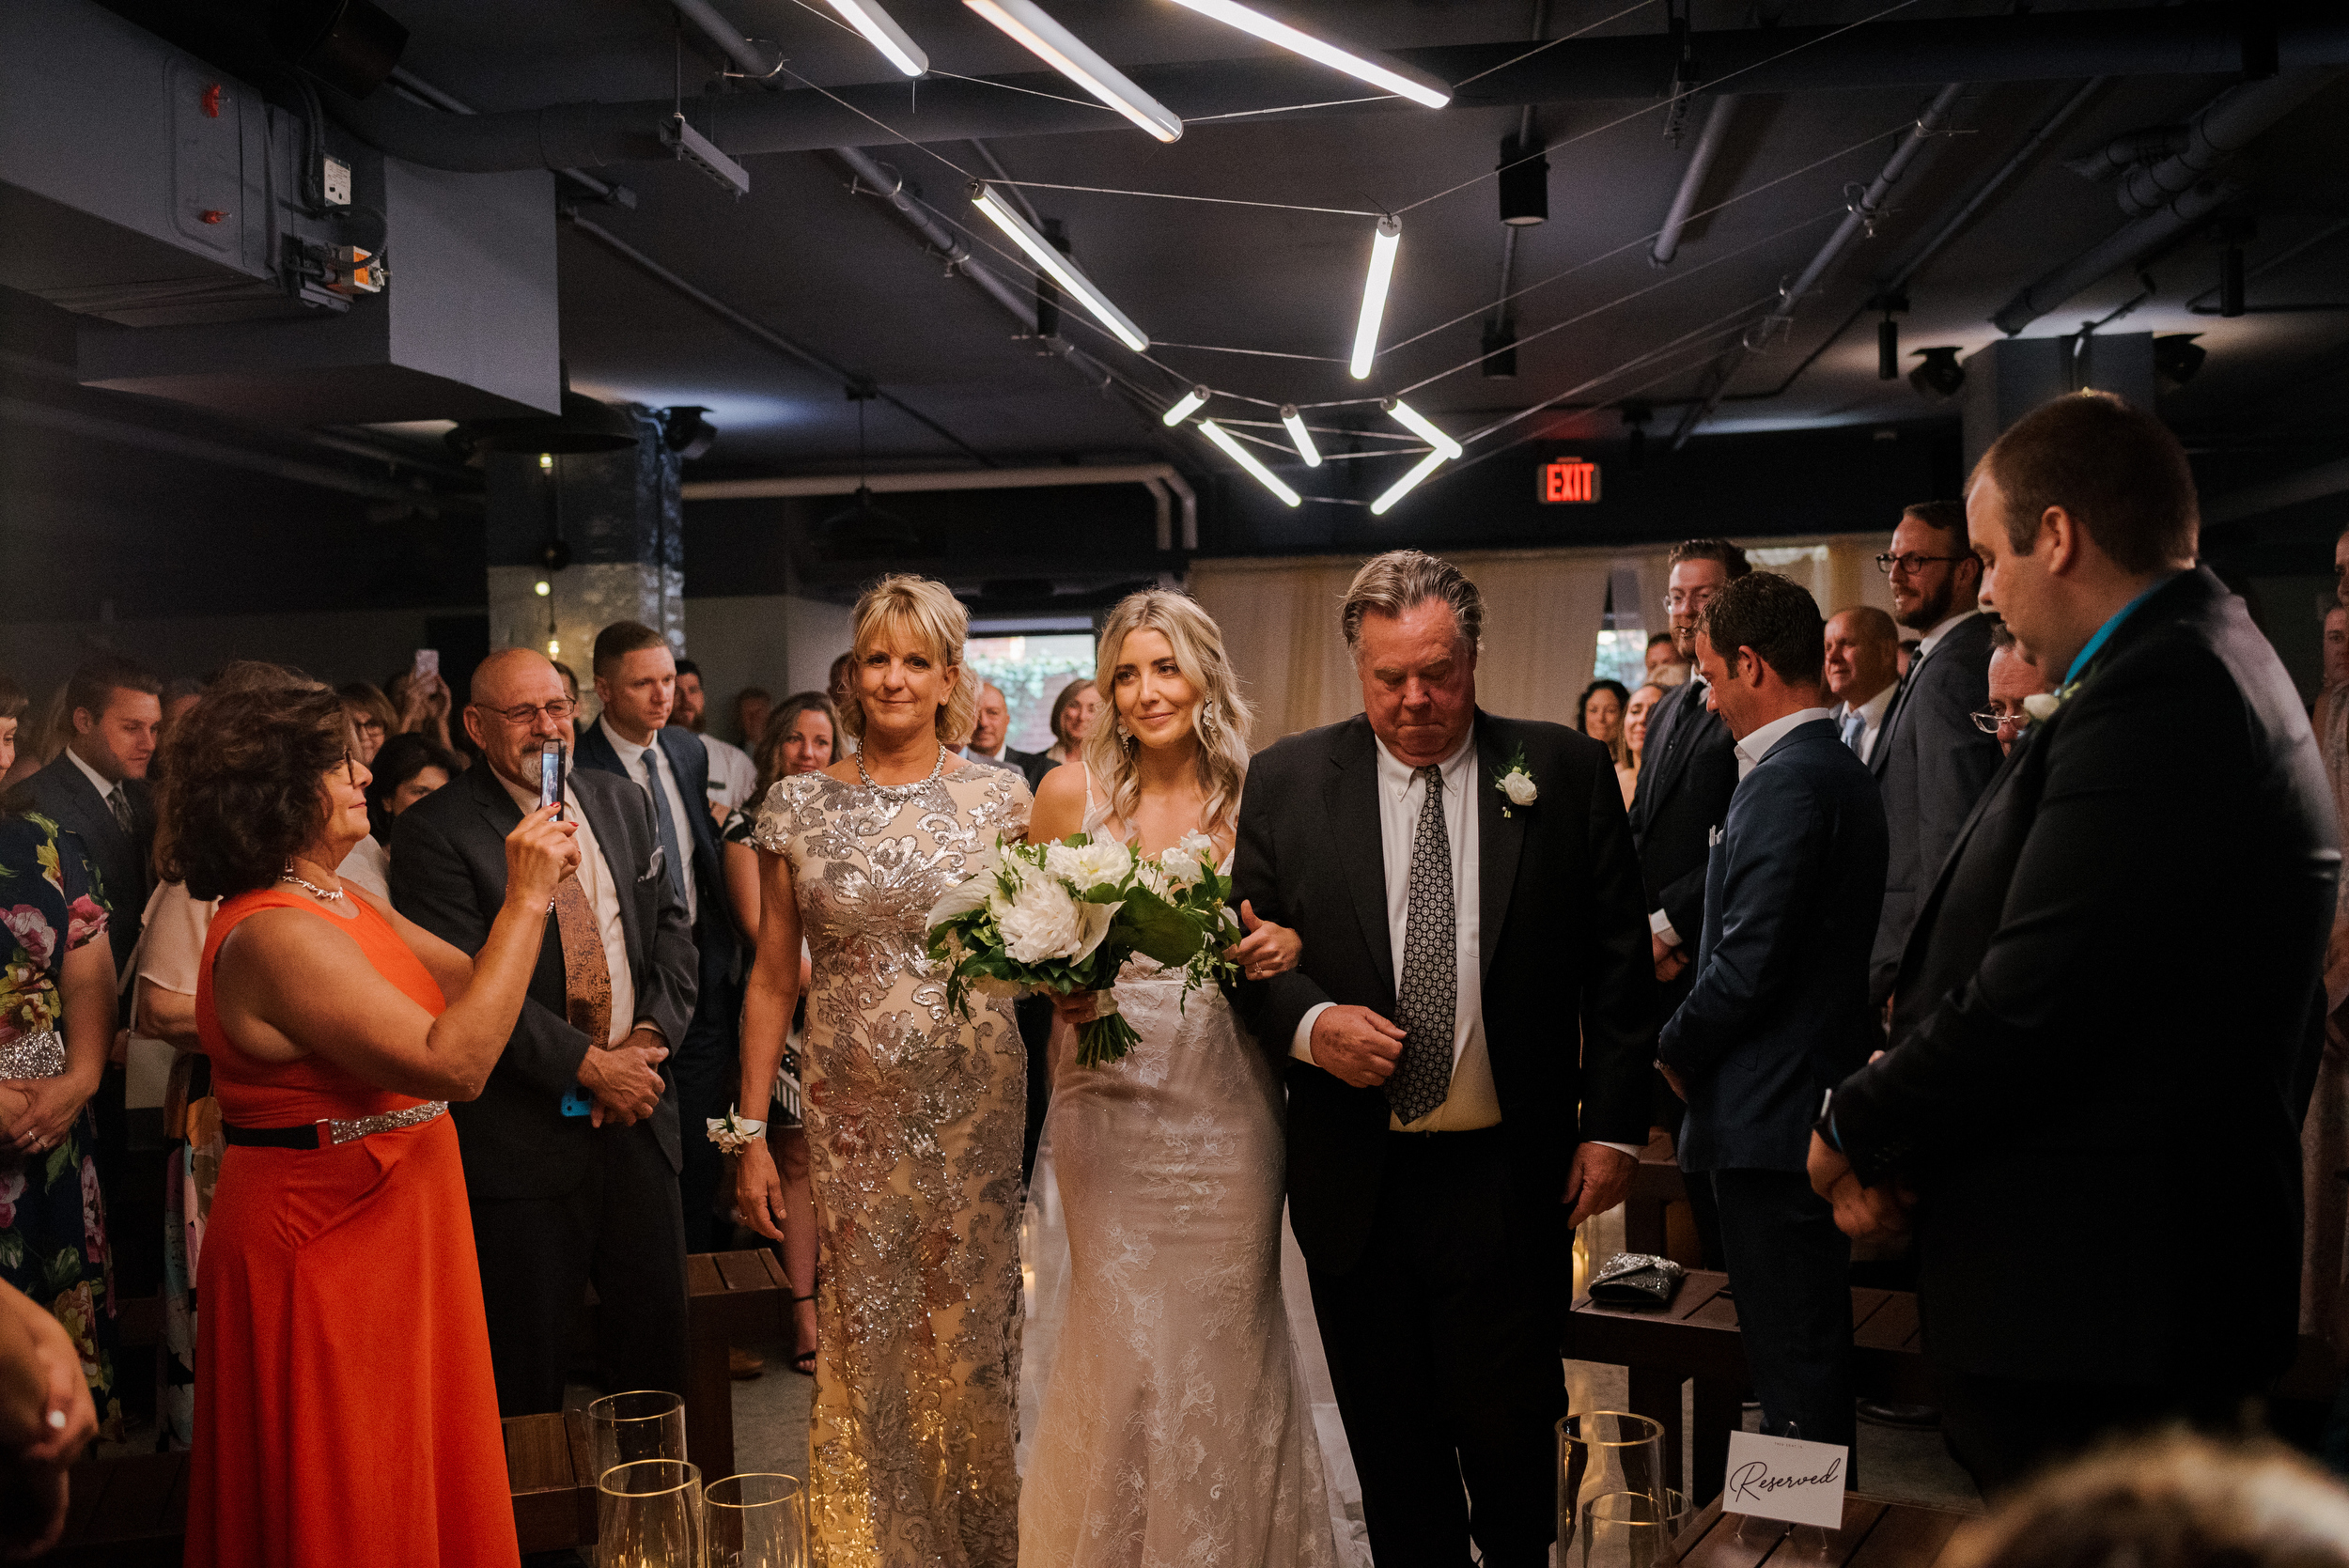 the_hotel_salem_wedding_mikhail_glabets_31.JPG